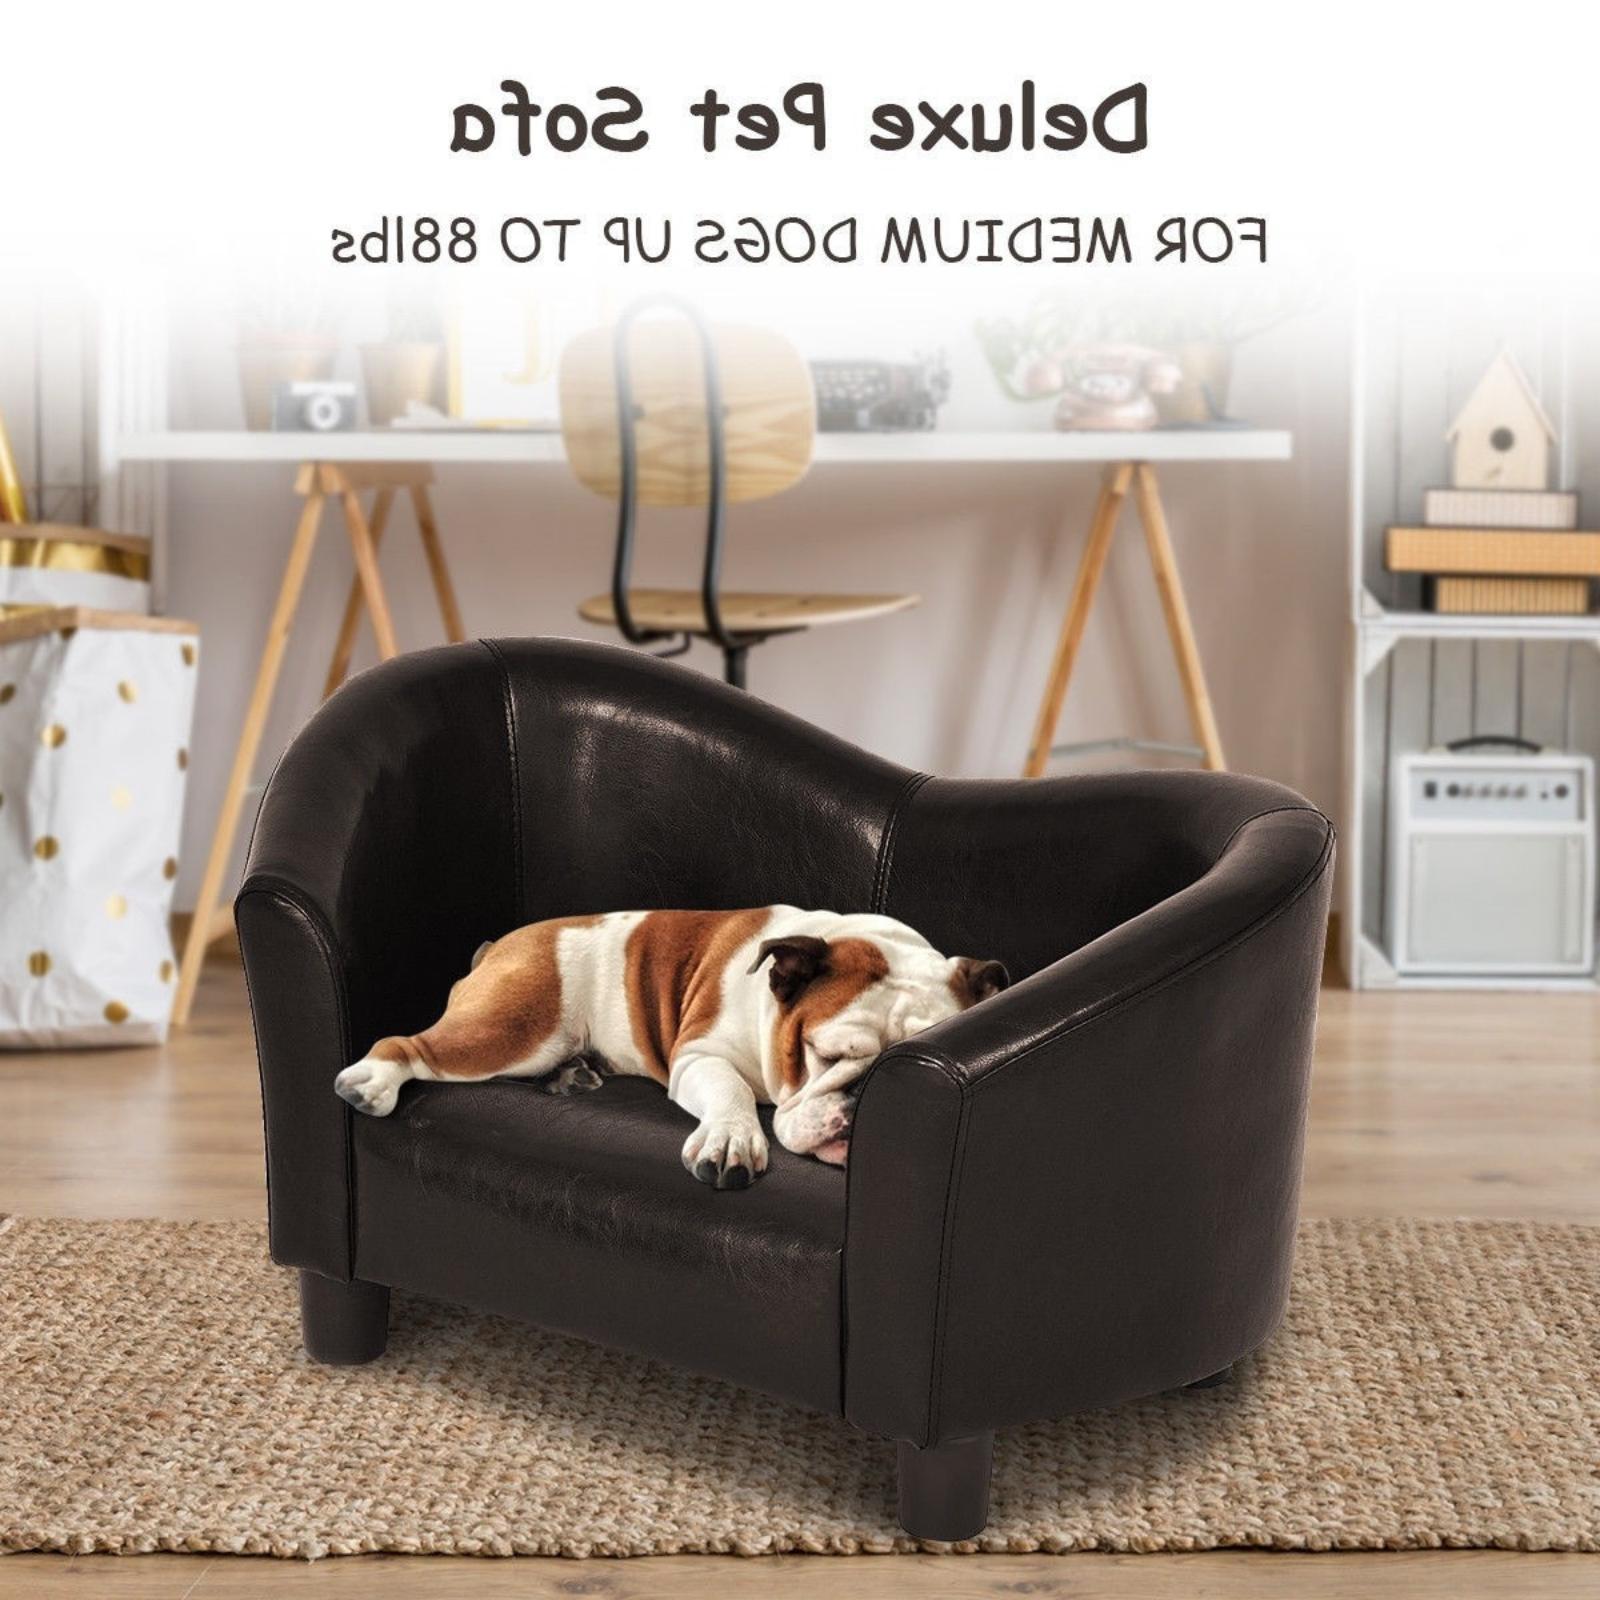 Dog Sofa Bed Comfort Stylish Dog Sofa Couch Elevated Raised